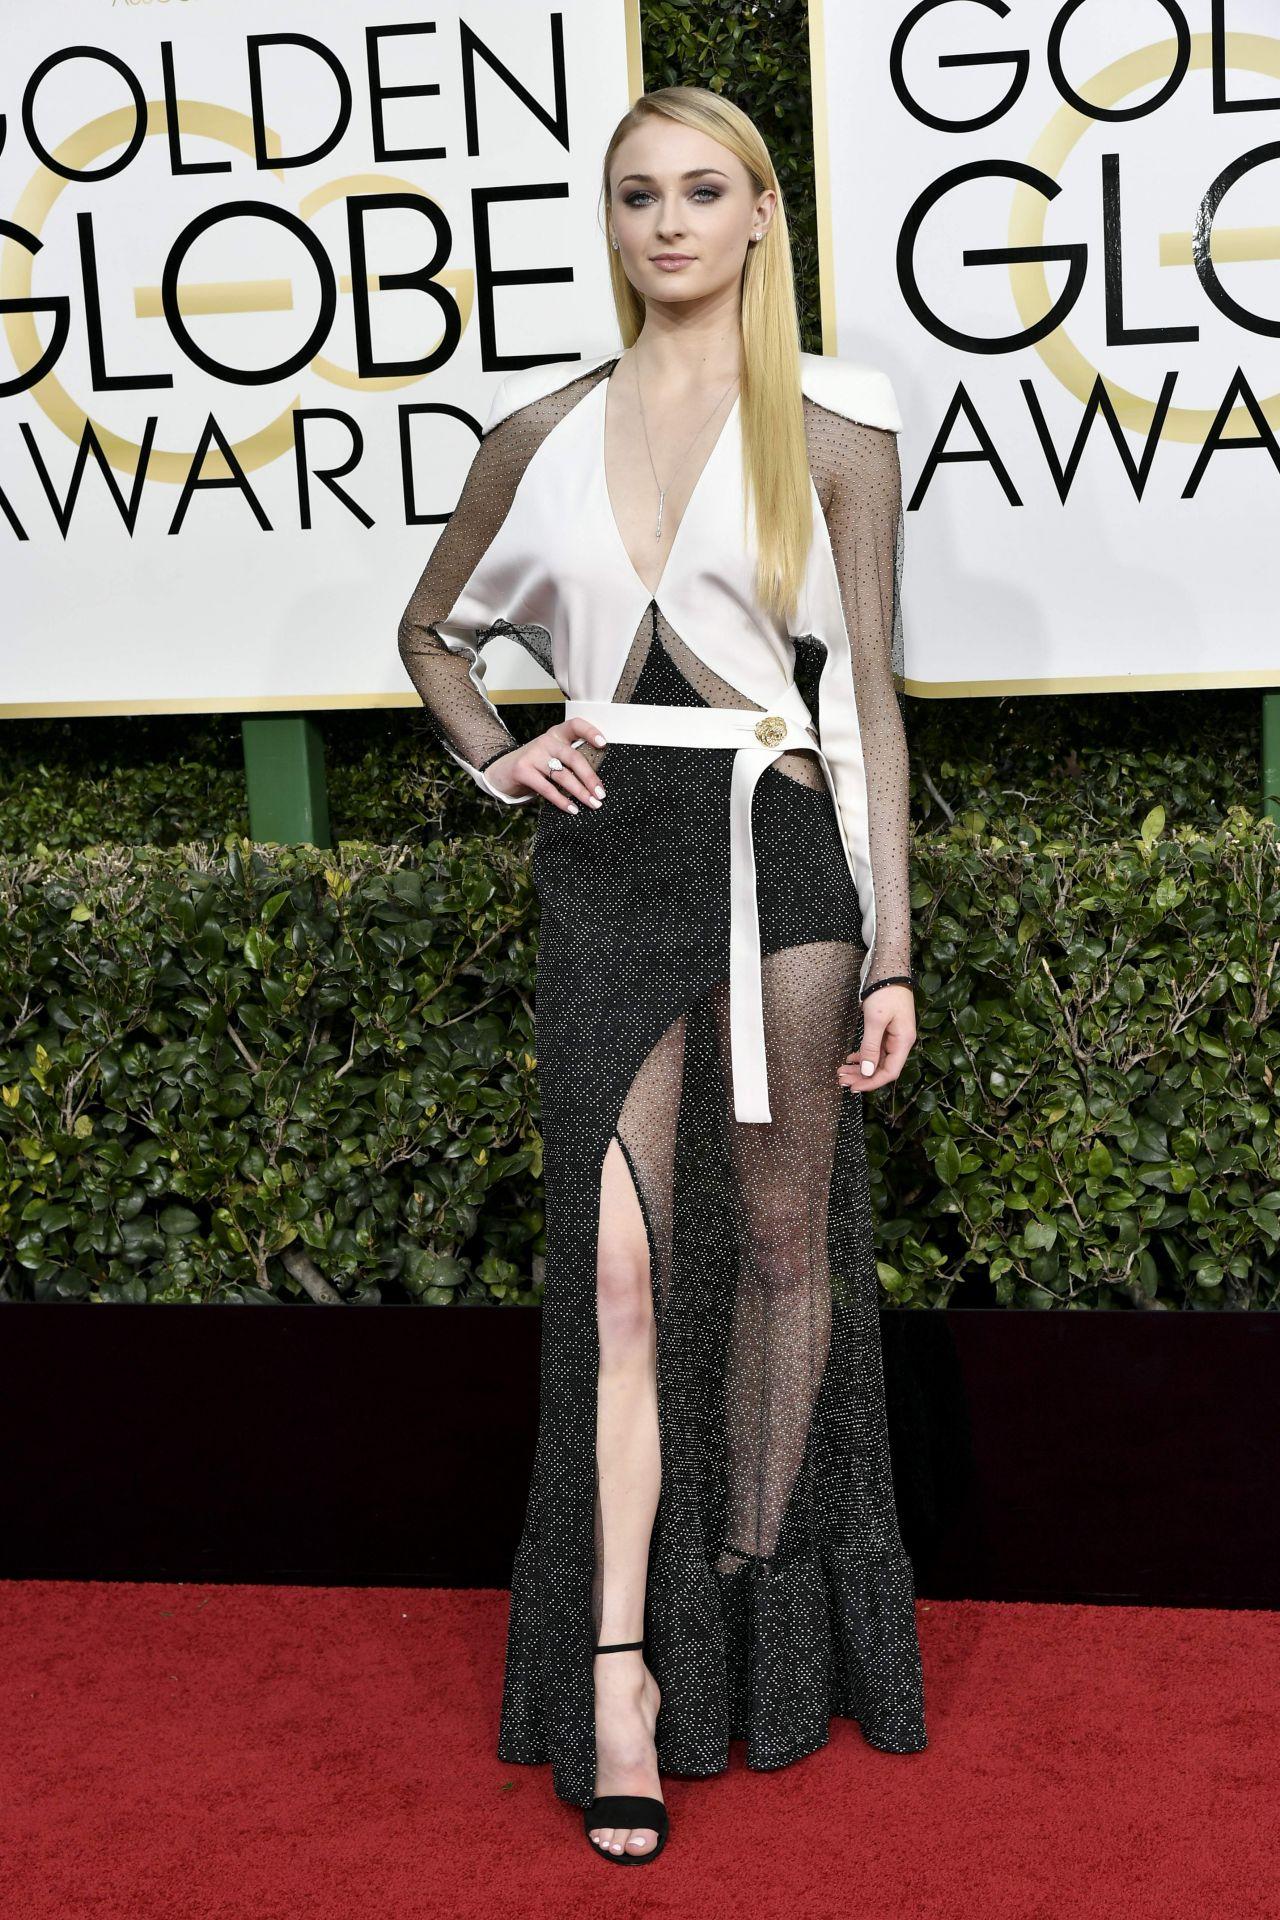 Sophie Turner Golden Globe Awards In Beverly Hills 01 08